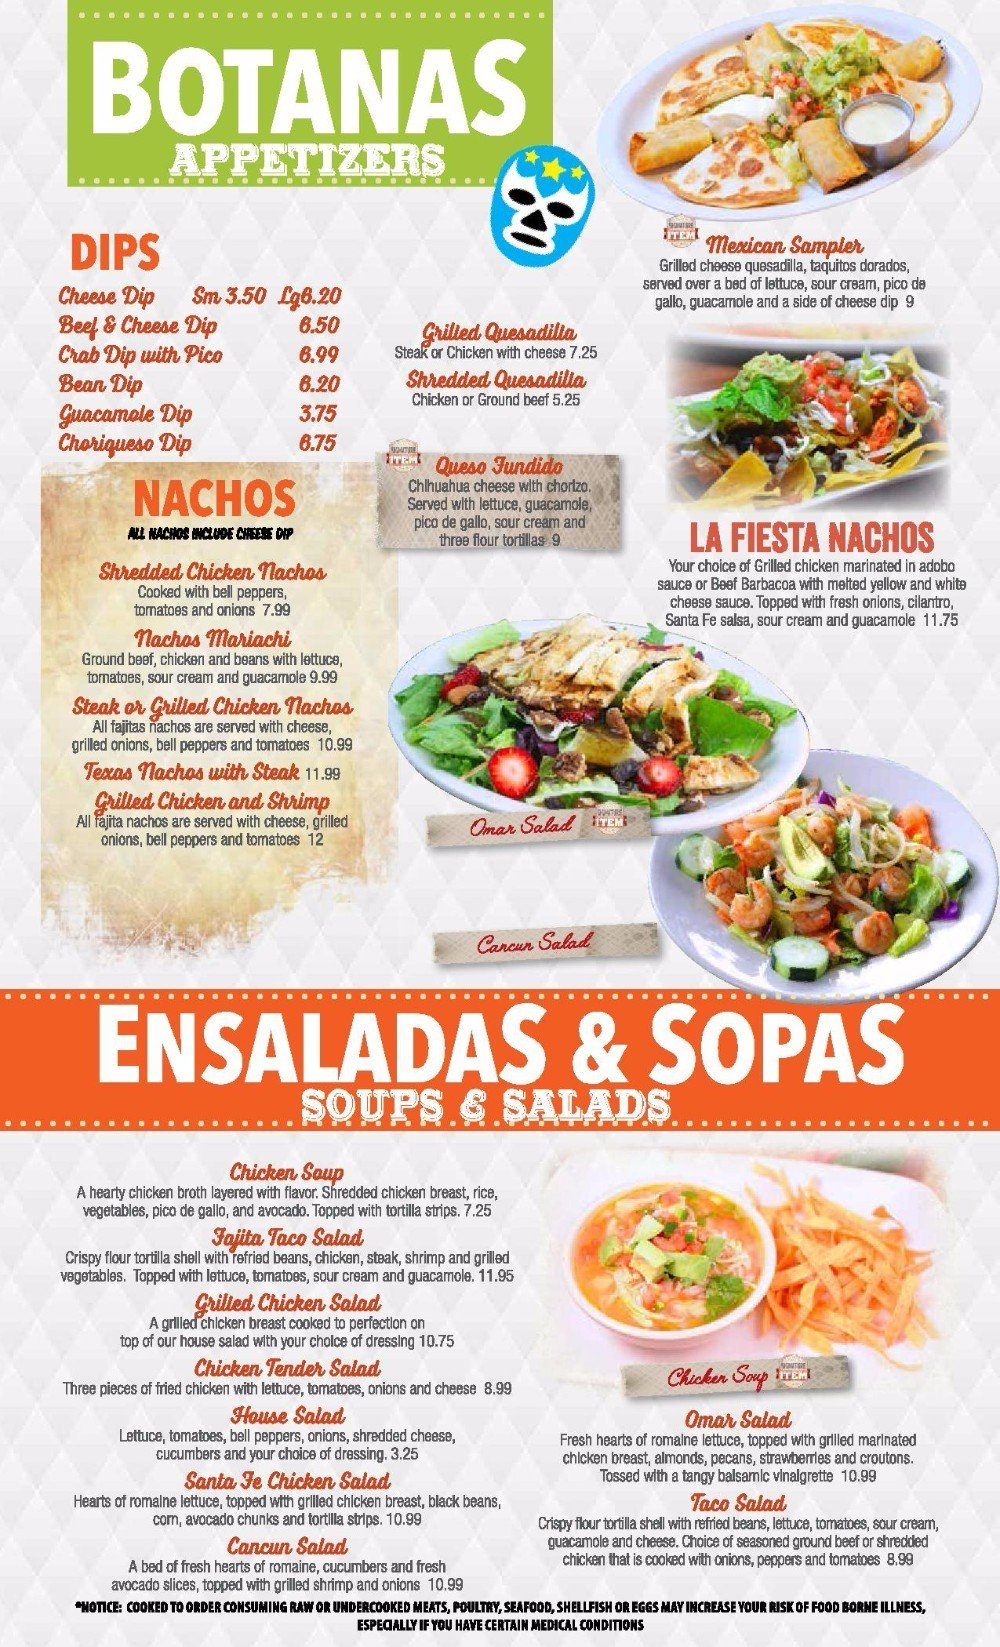 El Mariachi #2's Botanas appetizers